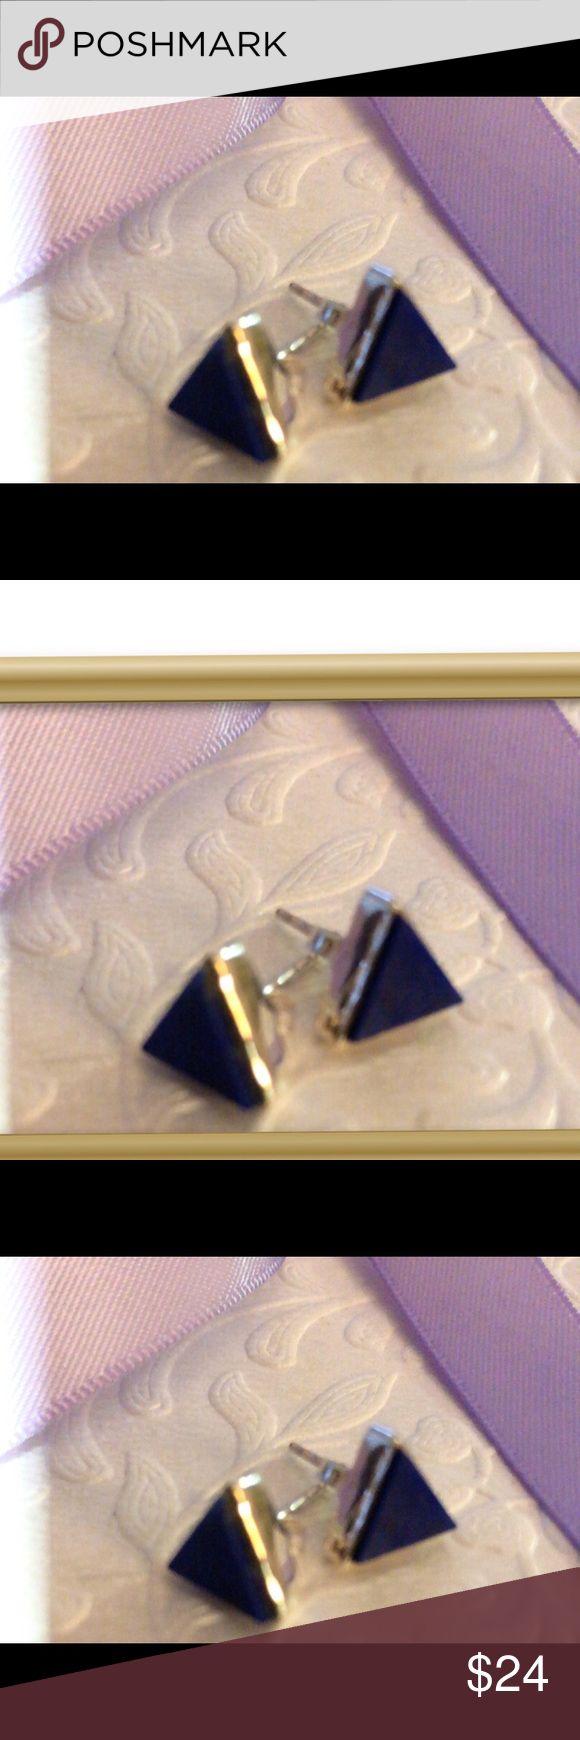 Onyx Deepest Blue Sterling Silver Stud Earrings Brand New Wrapped Sterling Silver Deep Blue Onyx Colored Stud Earrings .  Perfectly Cute Jewelry Earrings